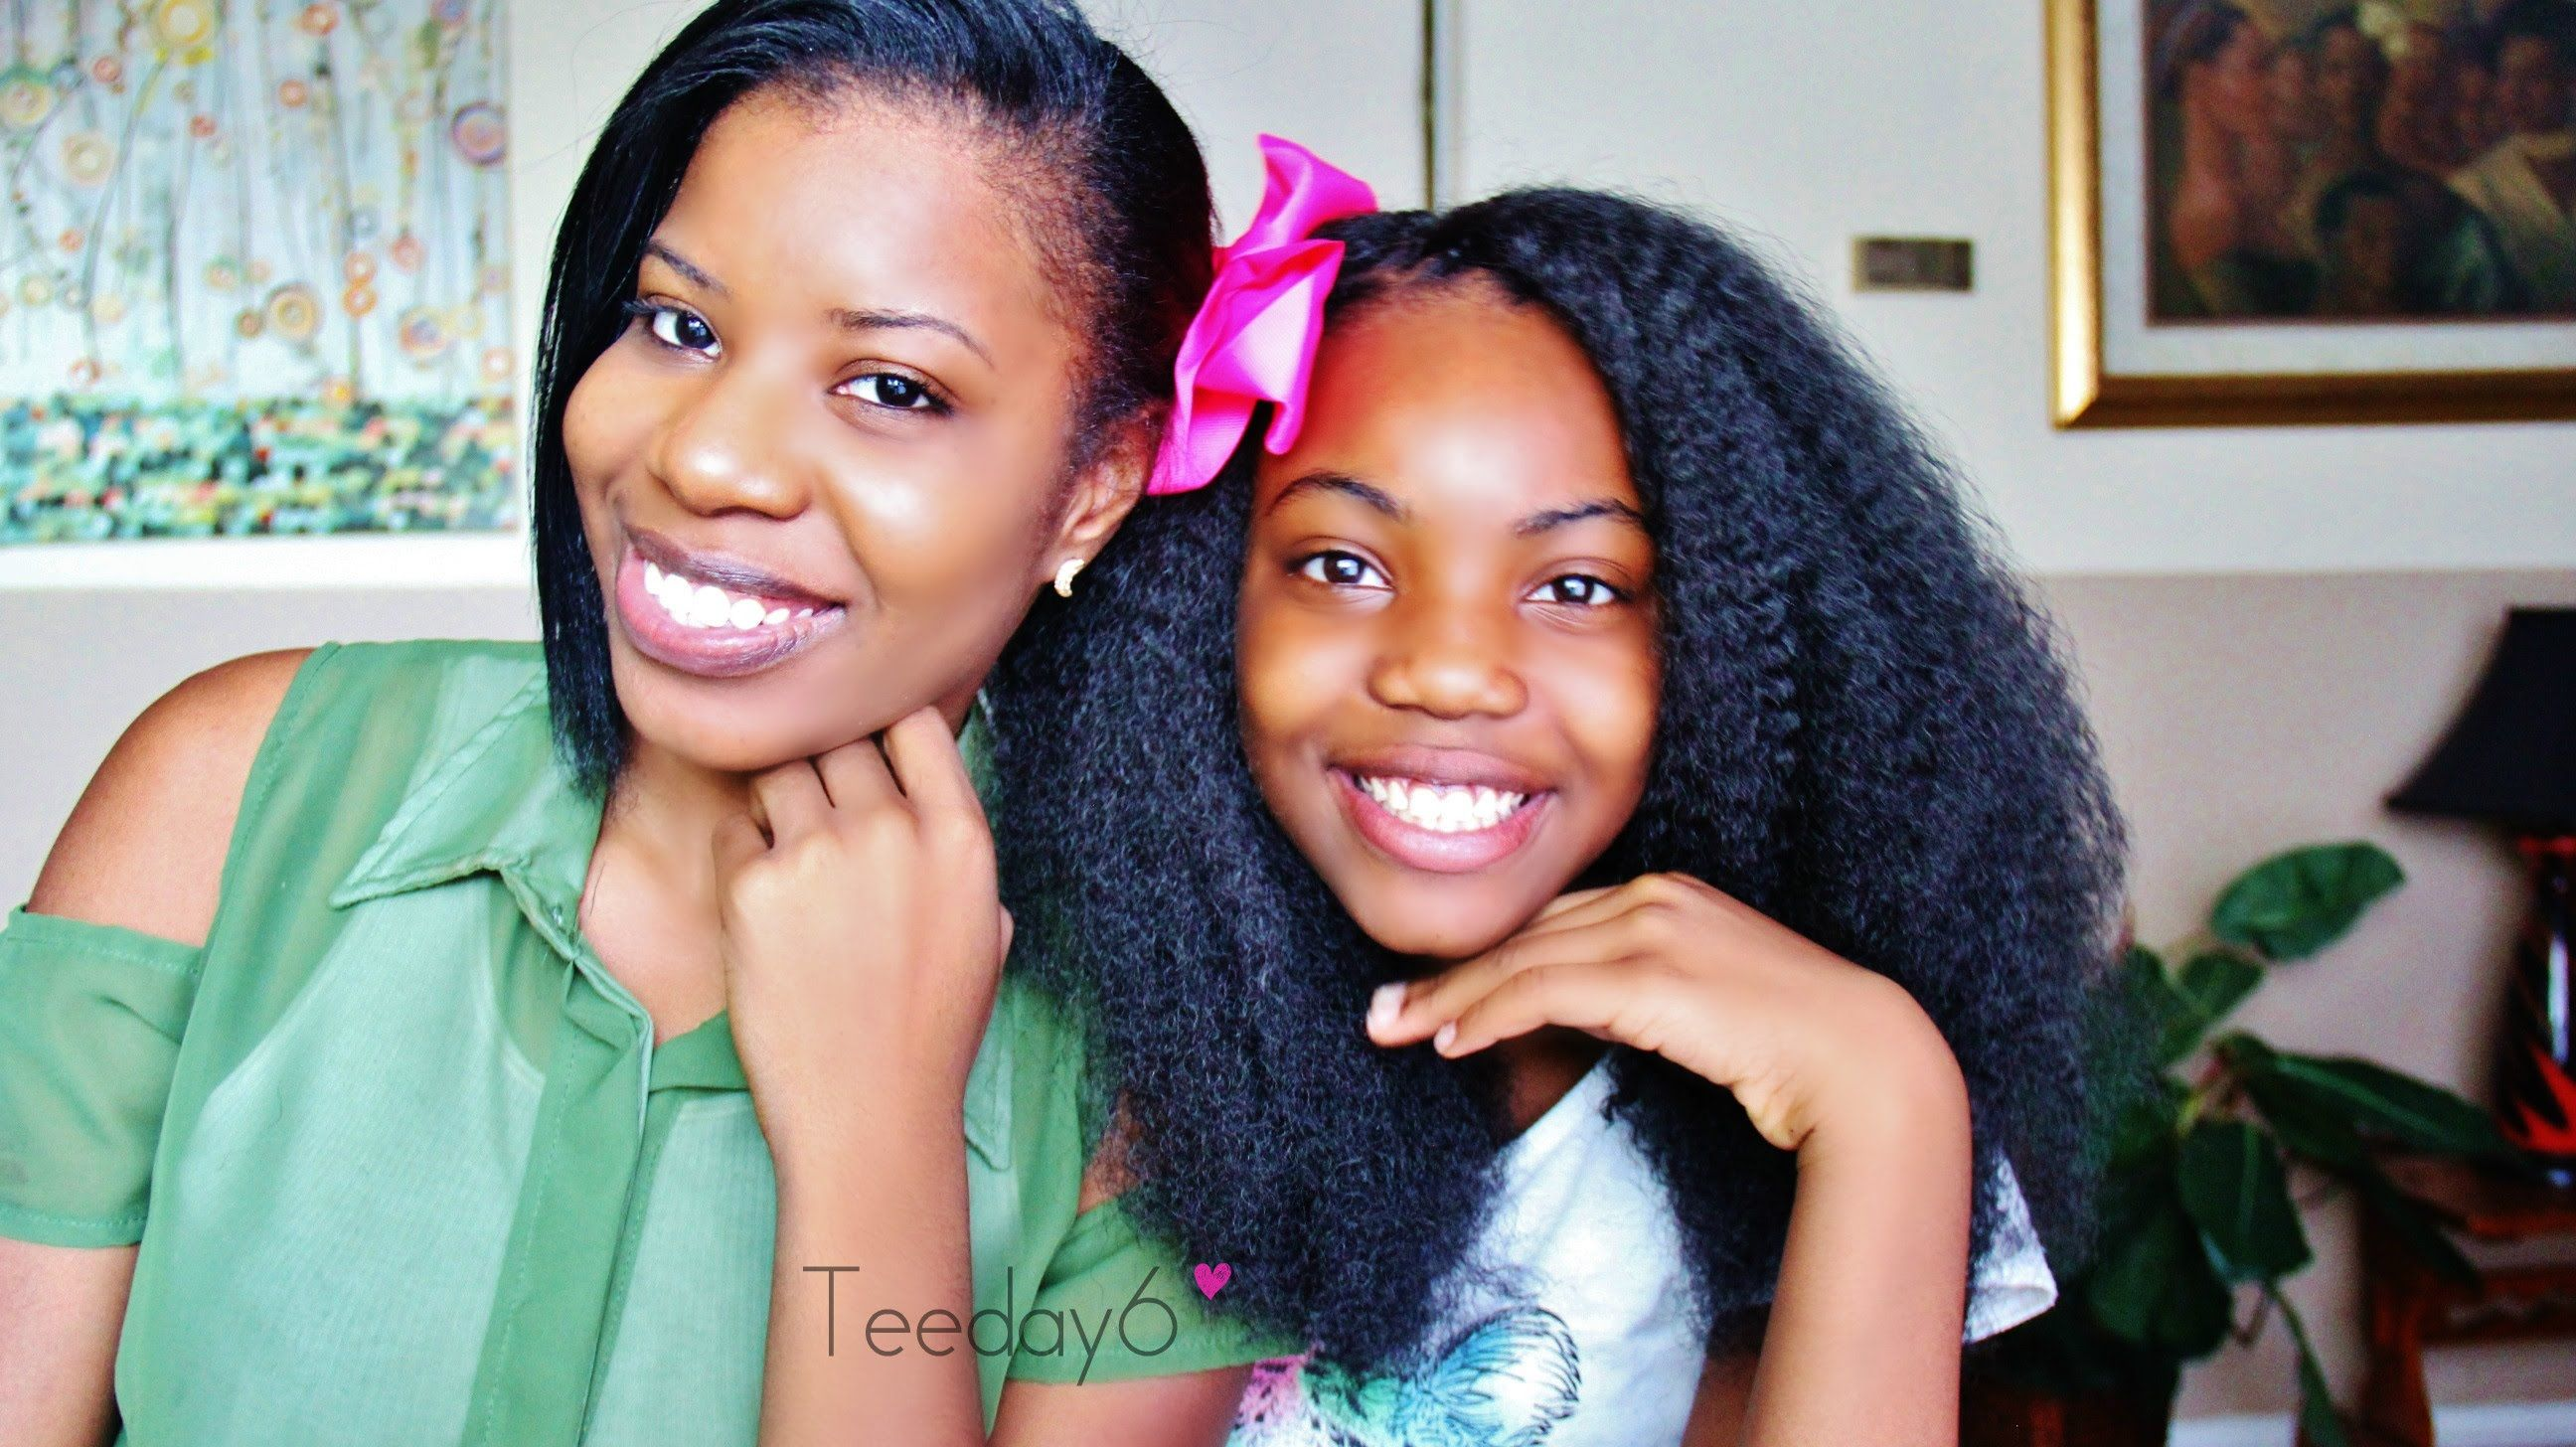 11 year old does her own crochet braids! | teeday6 | crochet